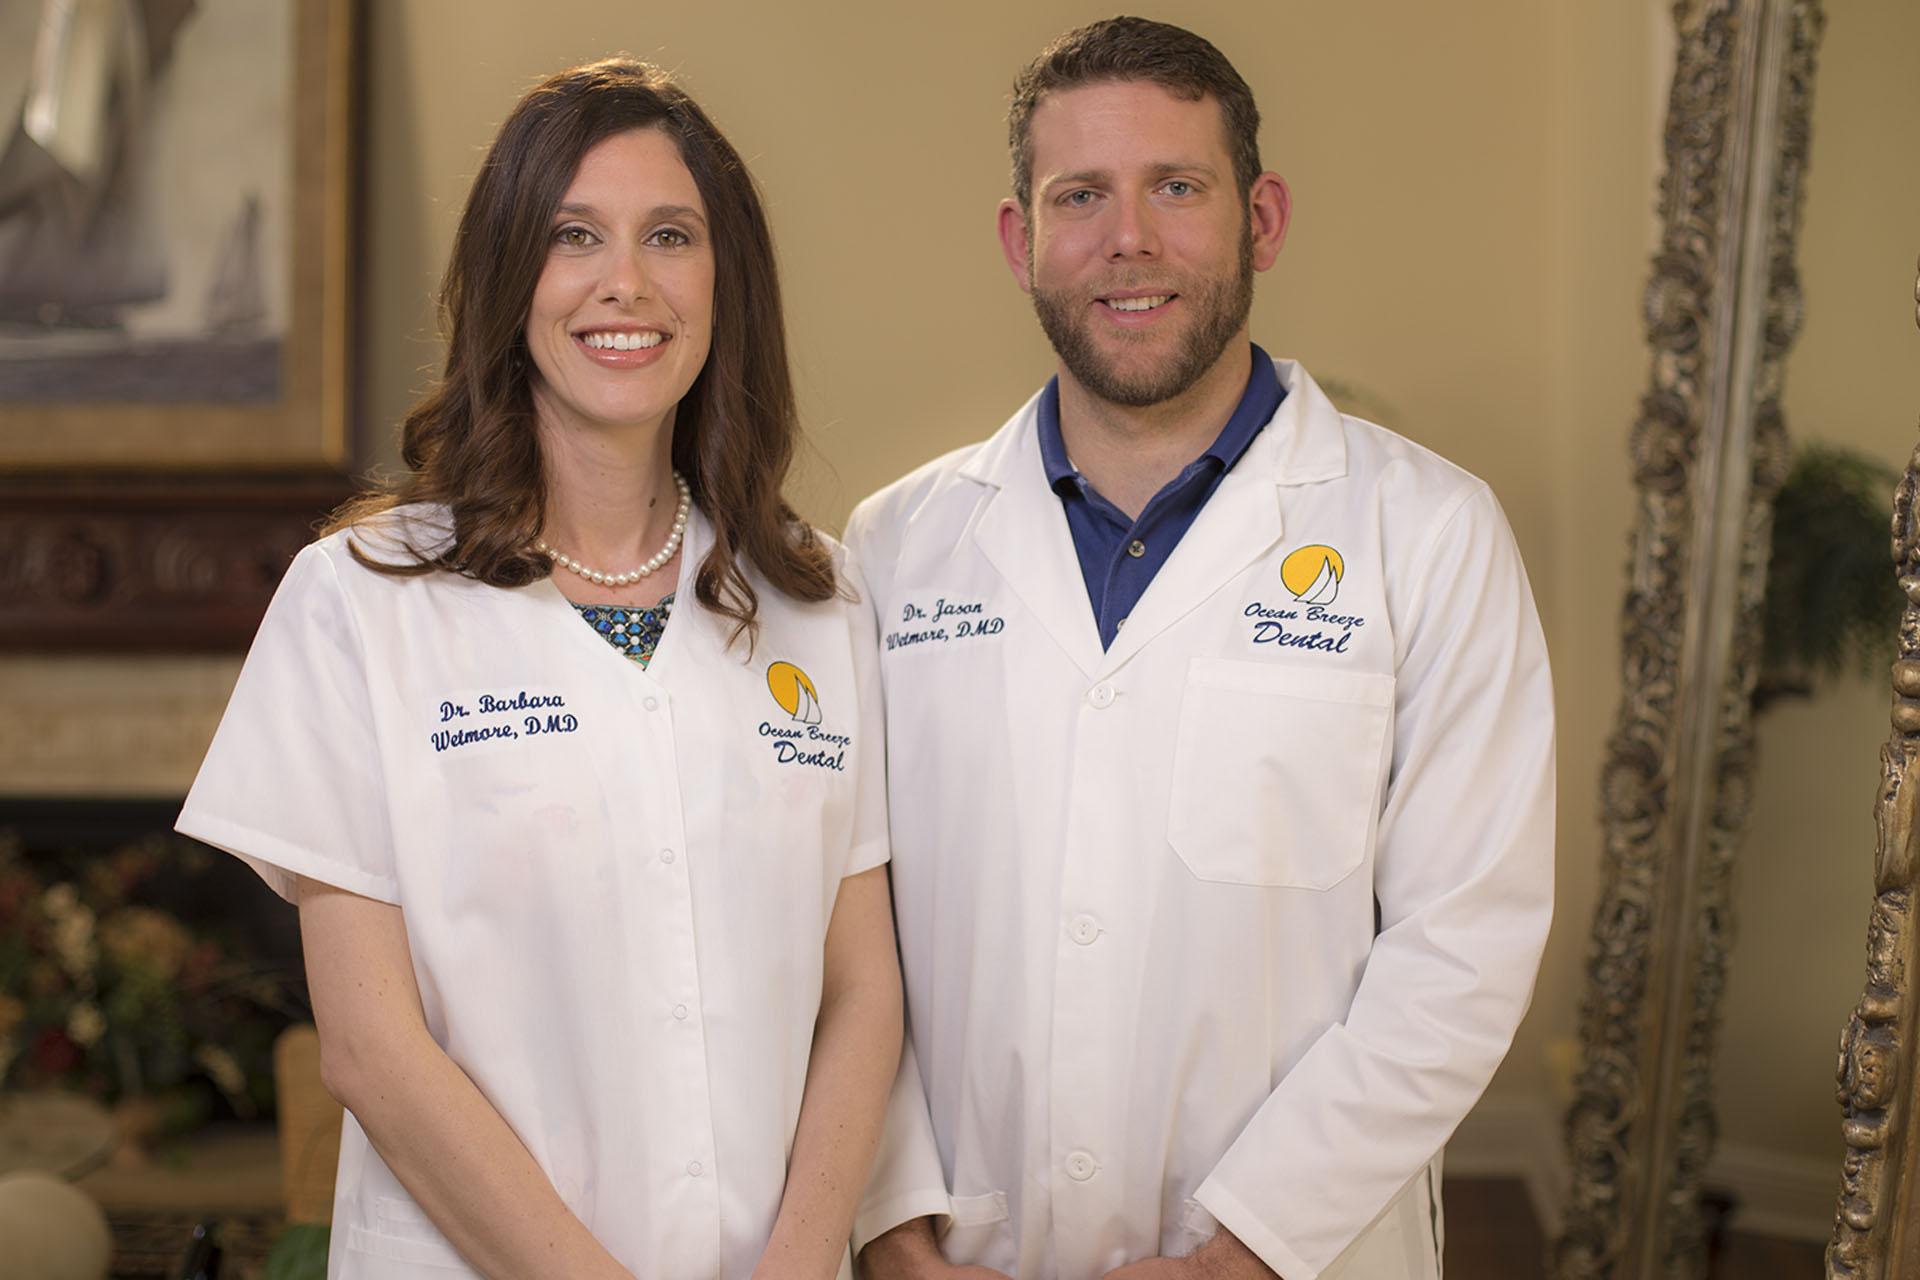 Drs. Barbara and Jason Wetmore